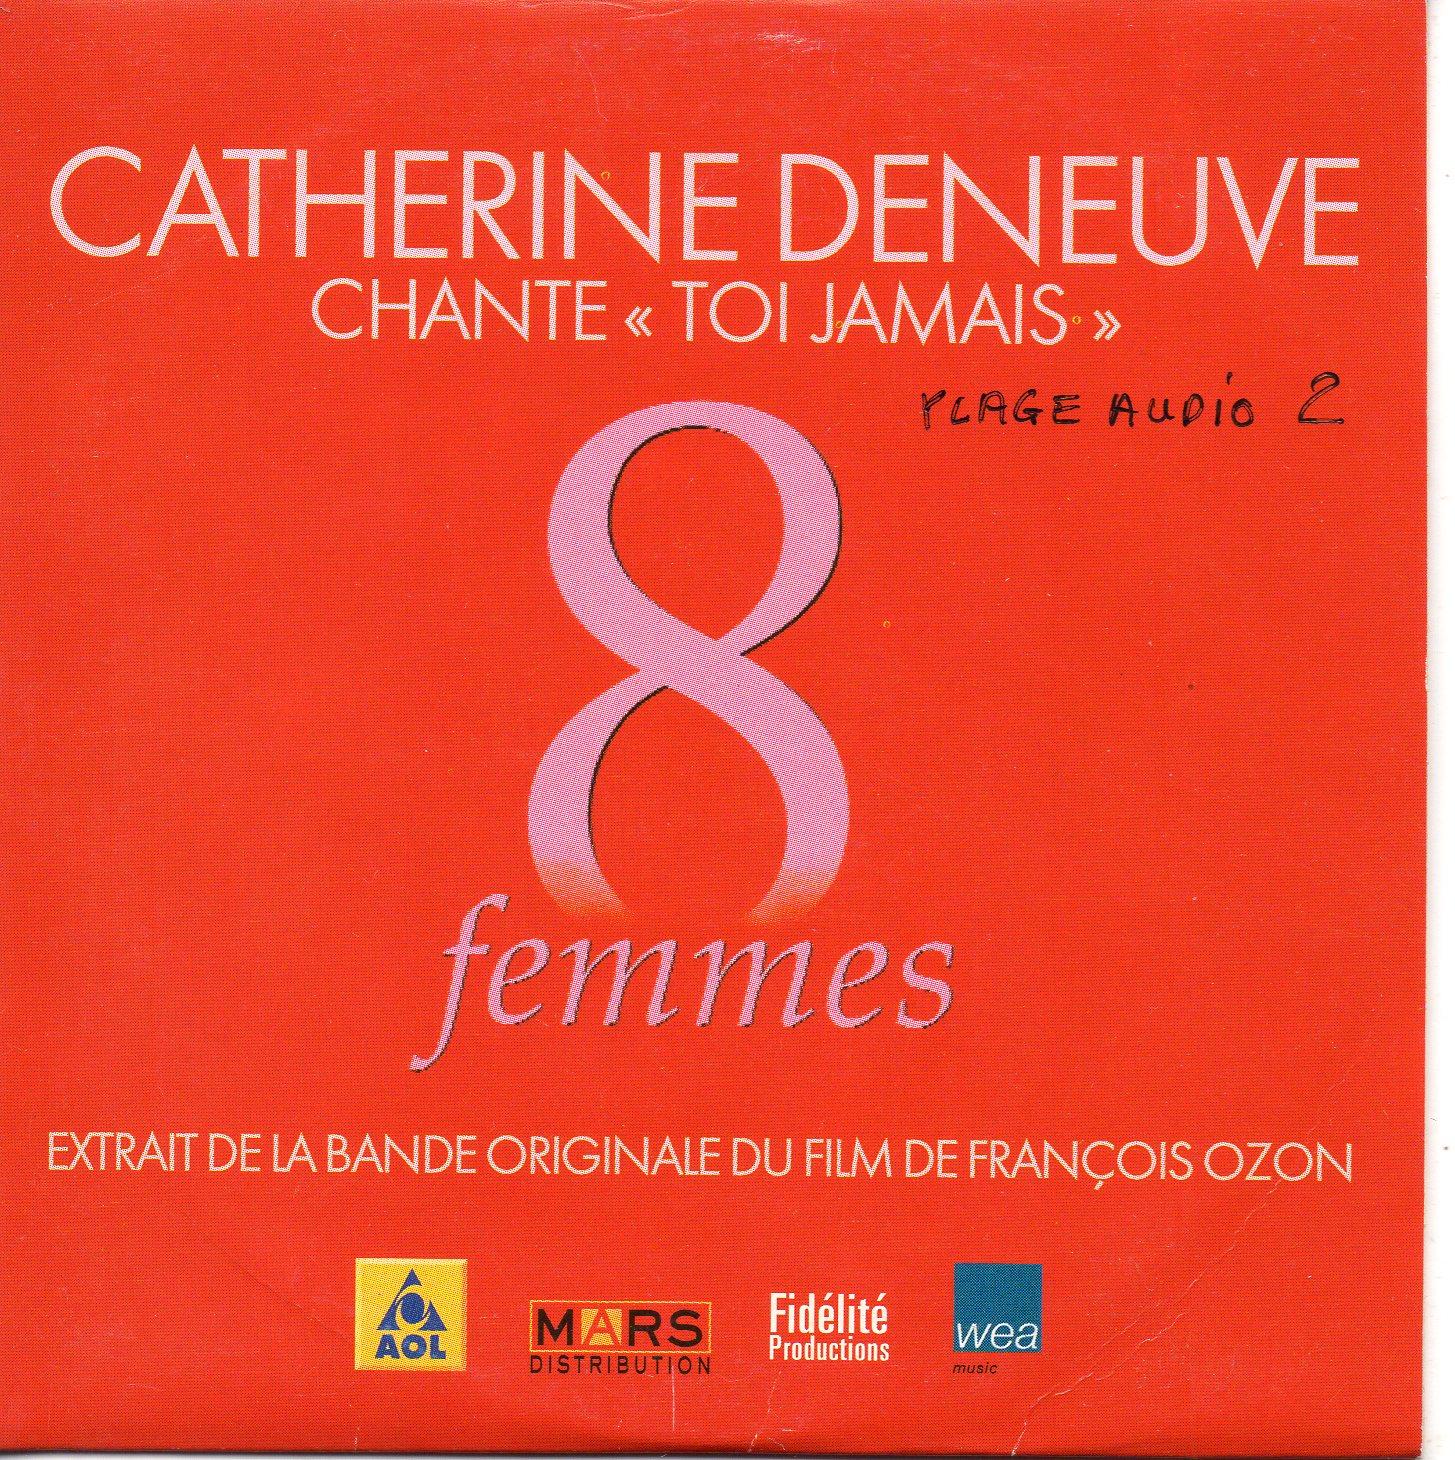 CATHERINE DENEUVE - SOUNDTRACK : 8 FEMMES - Toi Jamais 1-track CARD SLEEVE - CD single